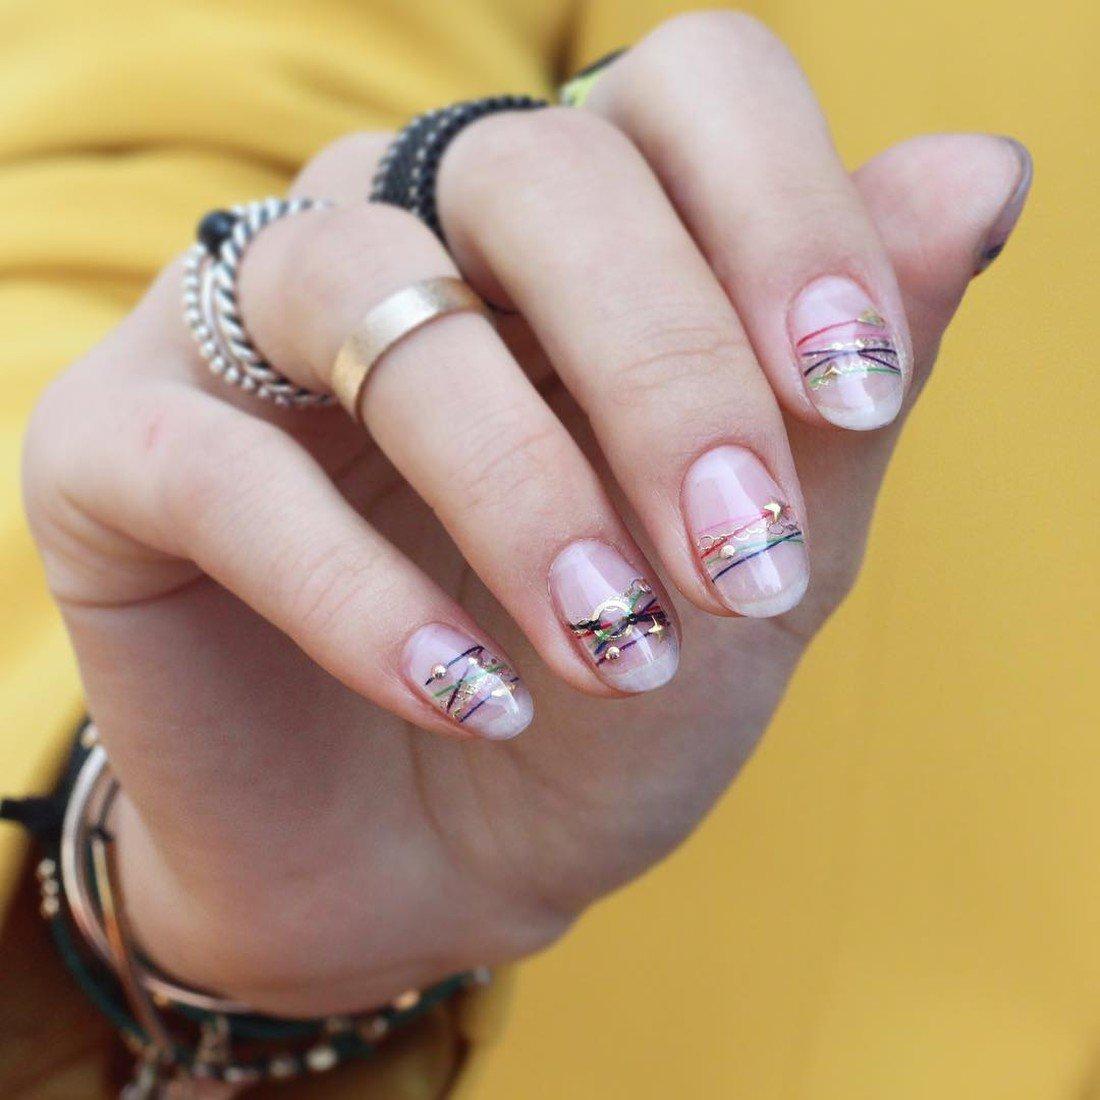 image13-71 | Модный дизайн ногтей — фото новинок маникюра 2018